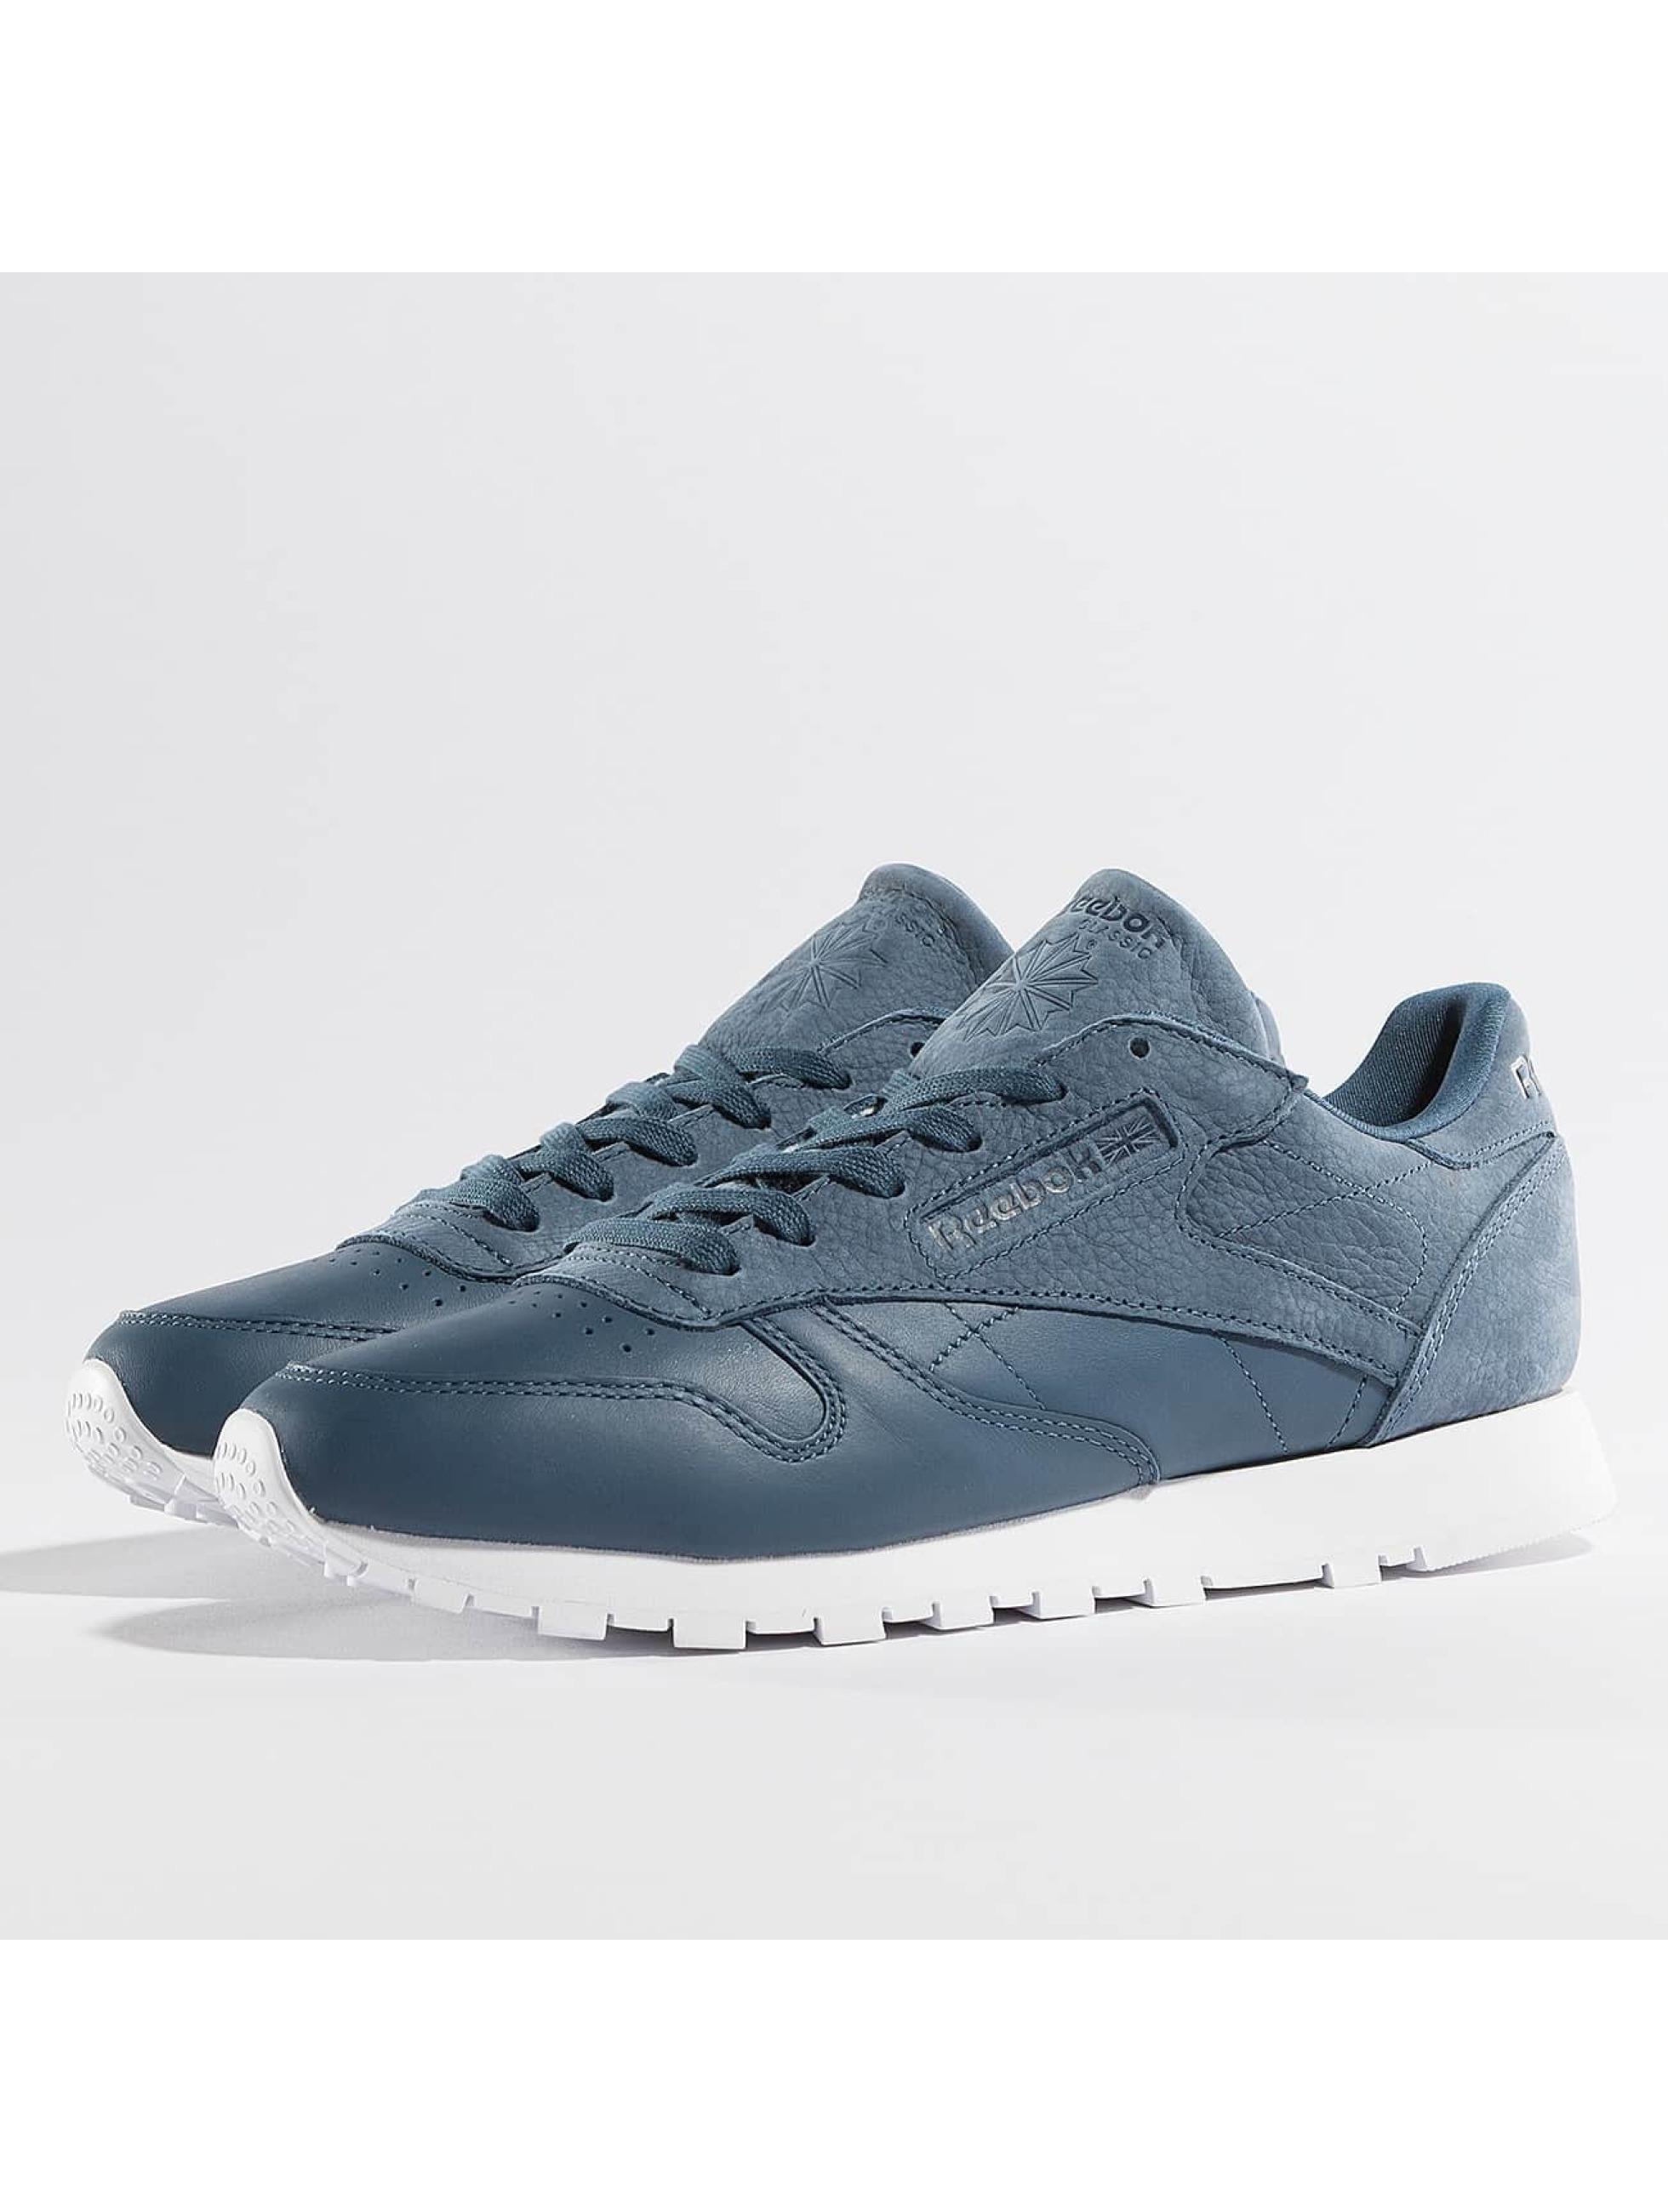 Reebok Frauen Sneaker Classic Leather Sea You Later in blau